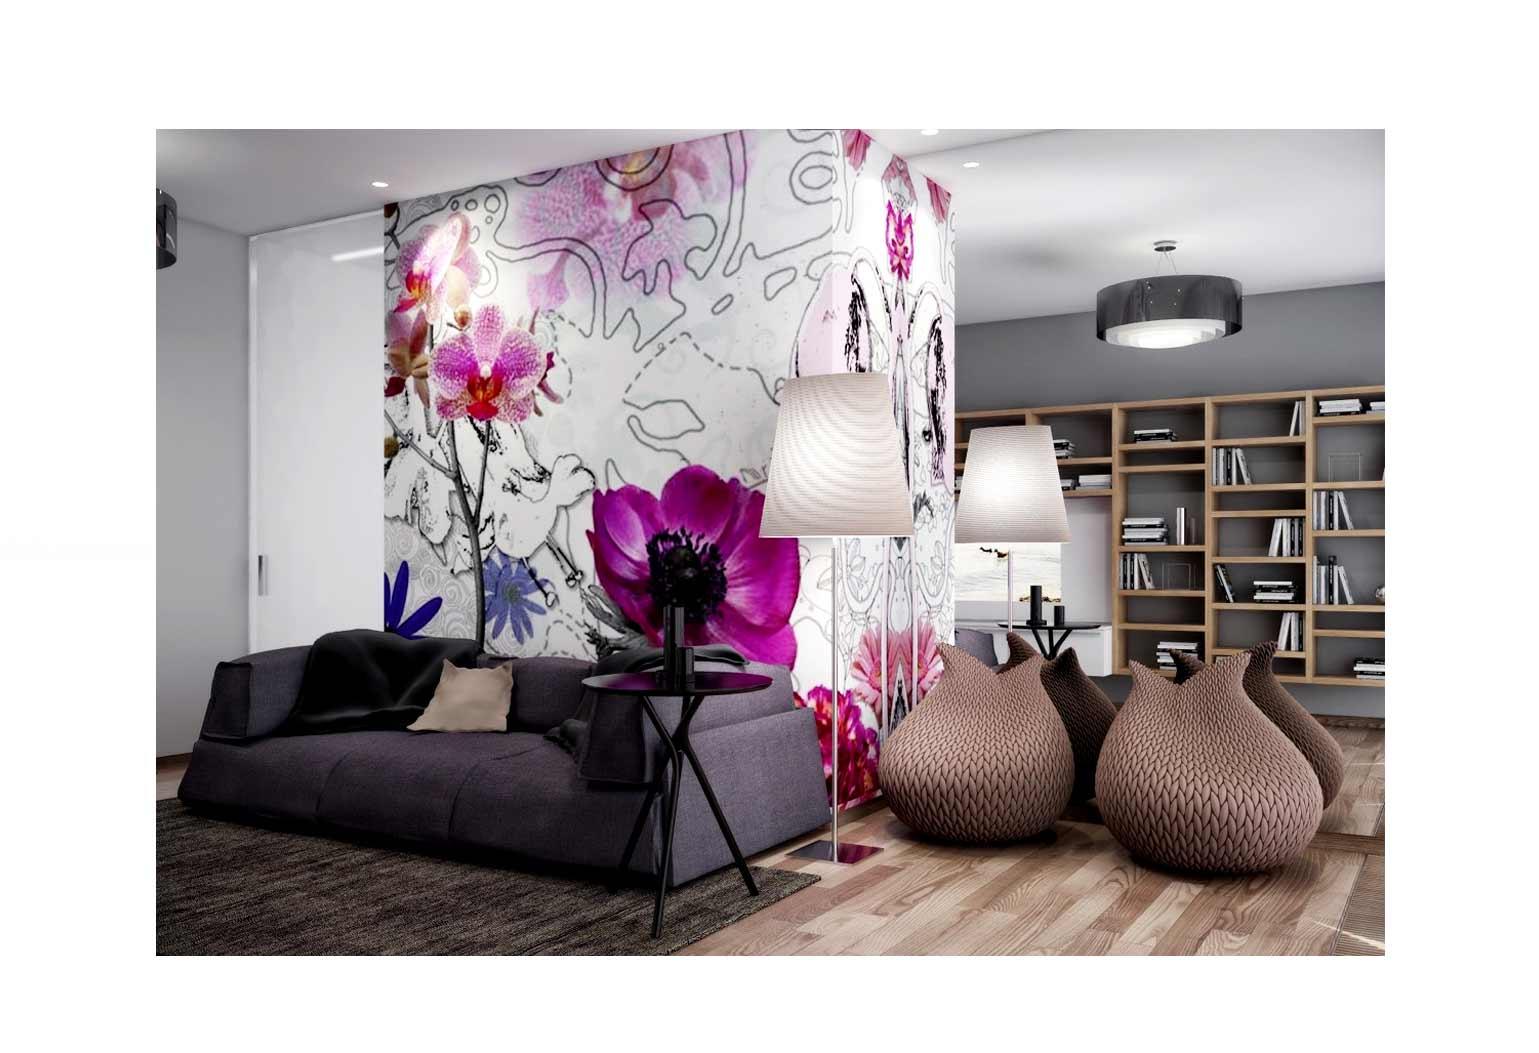 Design An Art centric Room077 - چگونه یک اتاق هنری را طراحی کنیم؟